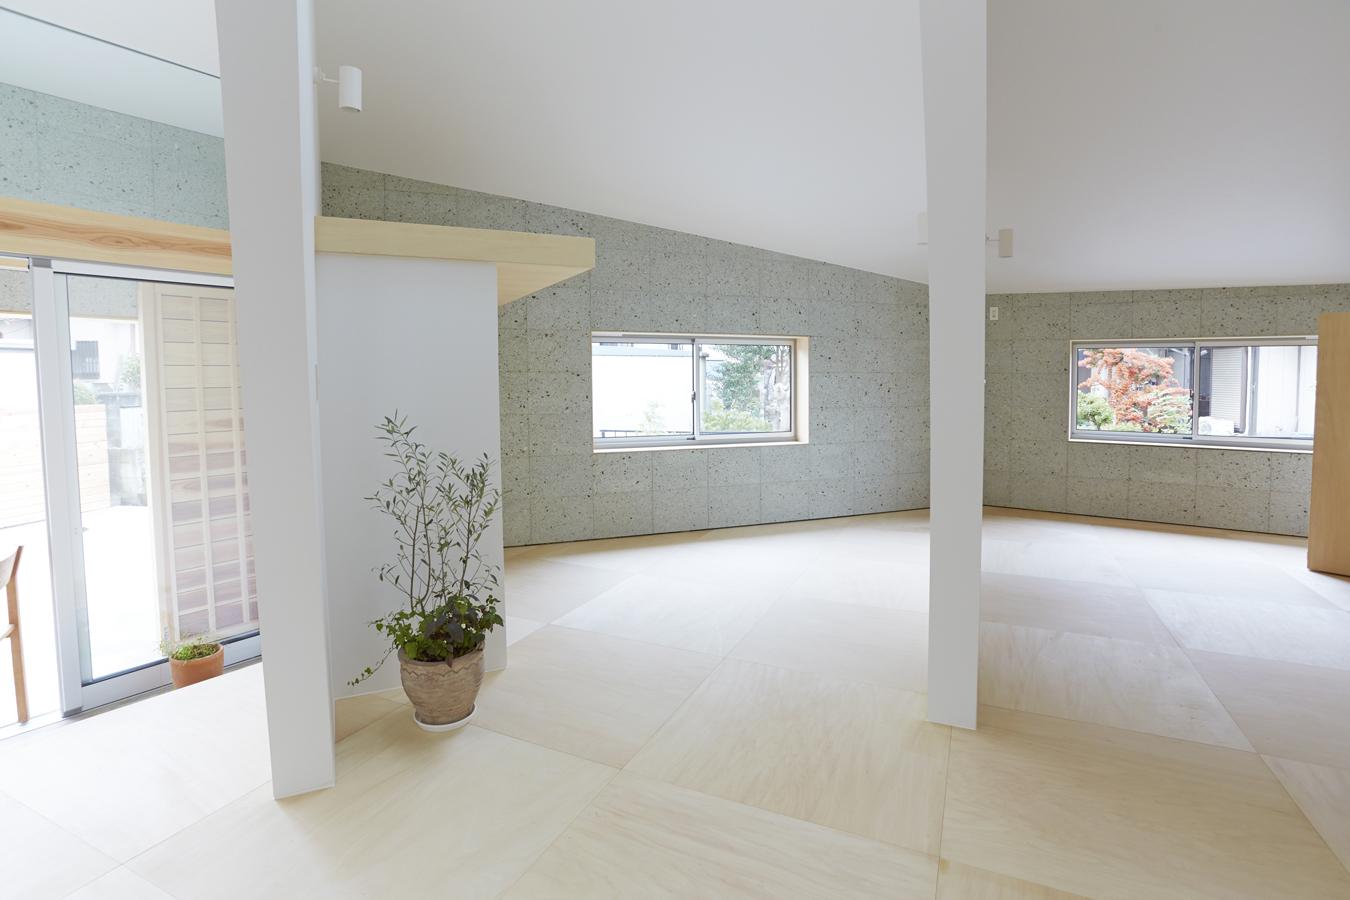 House i by hiroyuki shinozaki arc art blog by daniele drigo - Studiare interior design ...